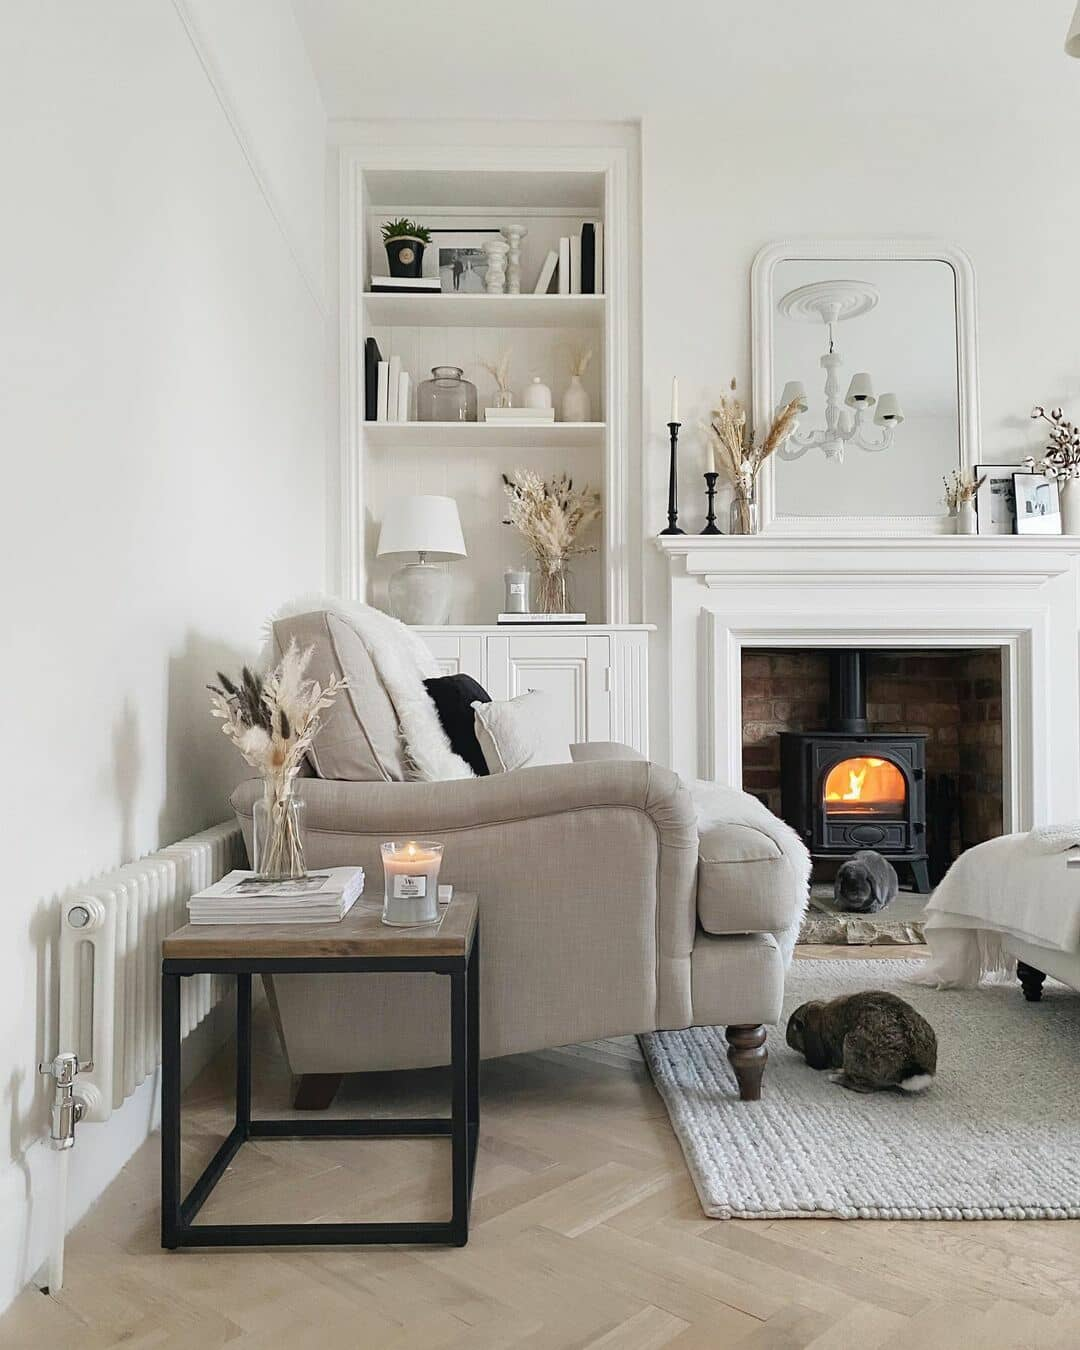 white radiator in a beige living room